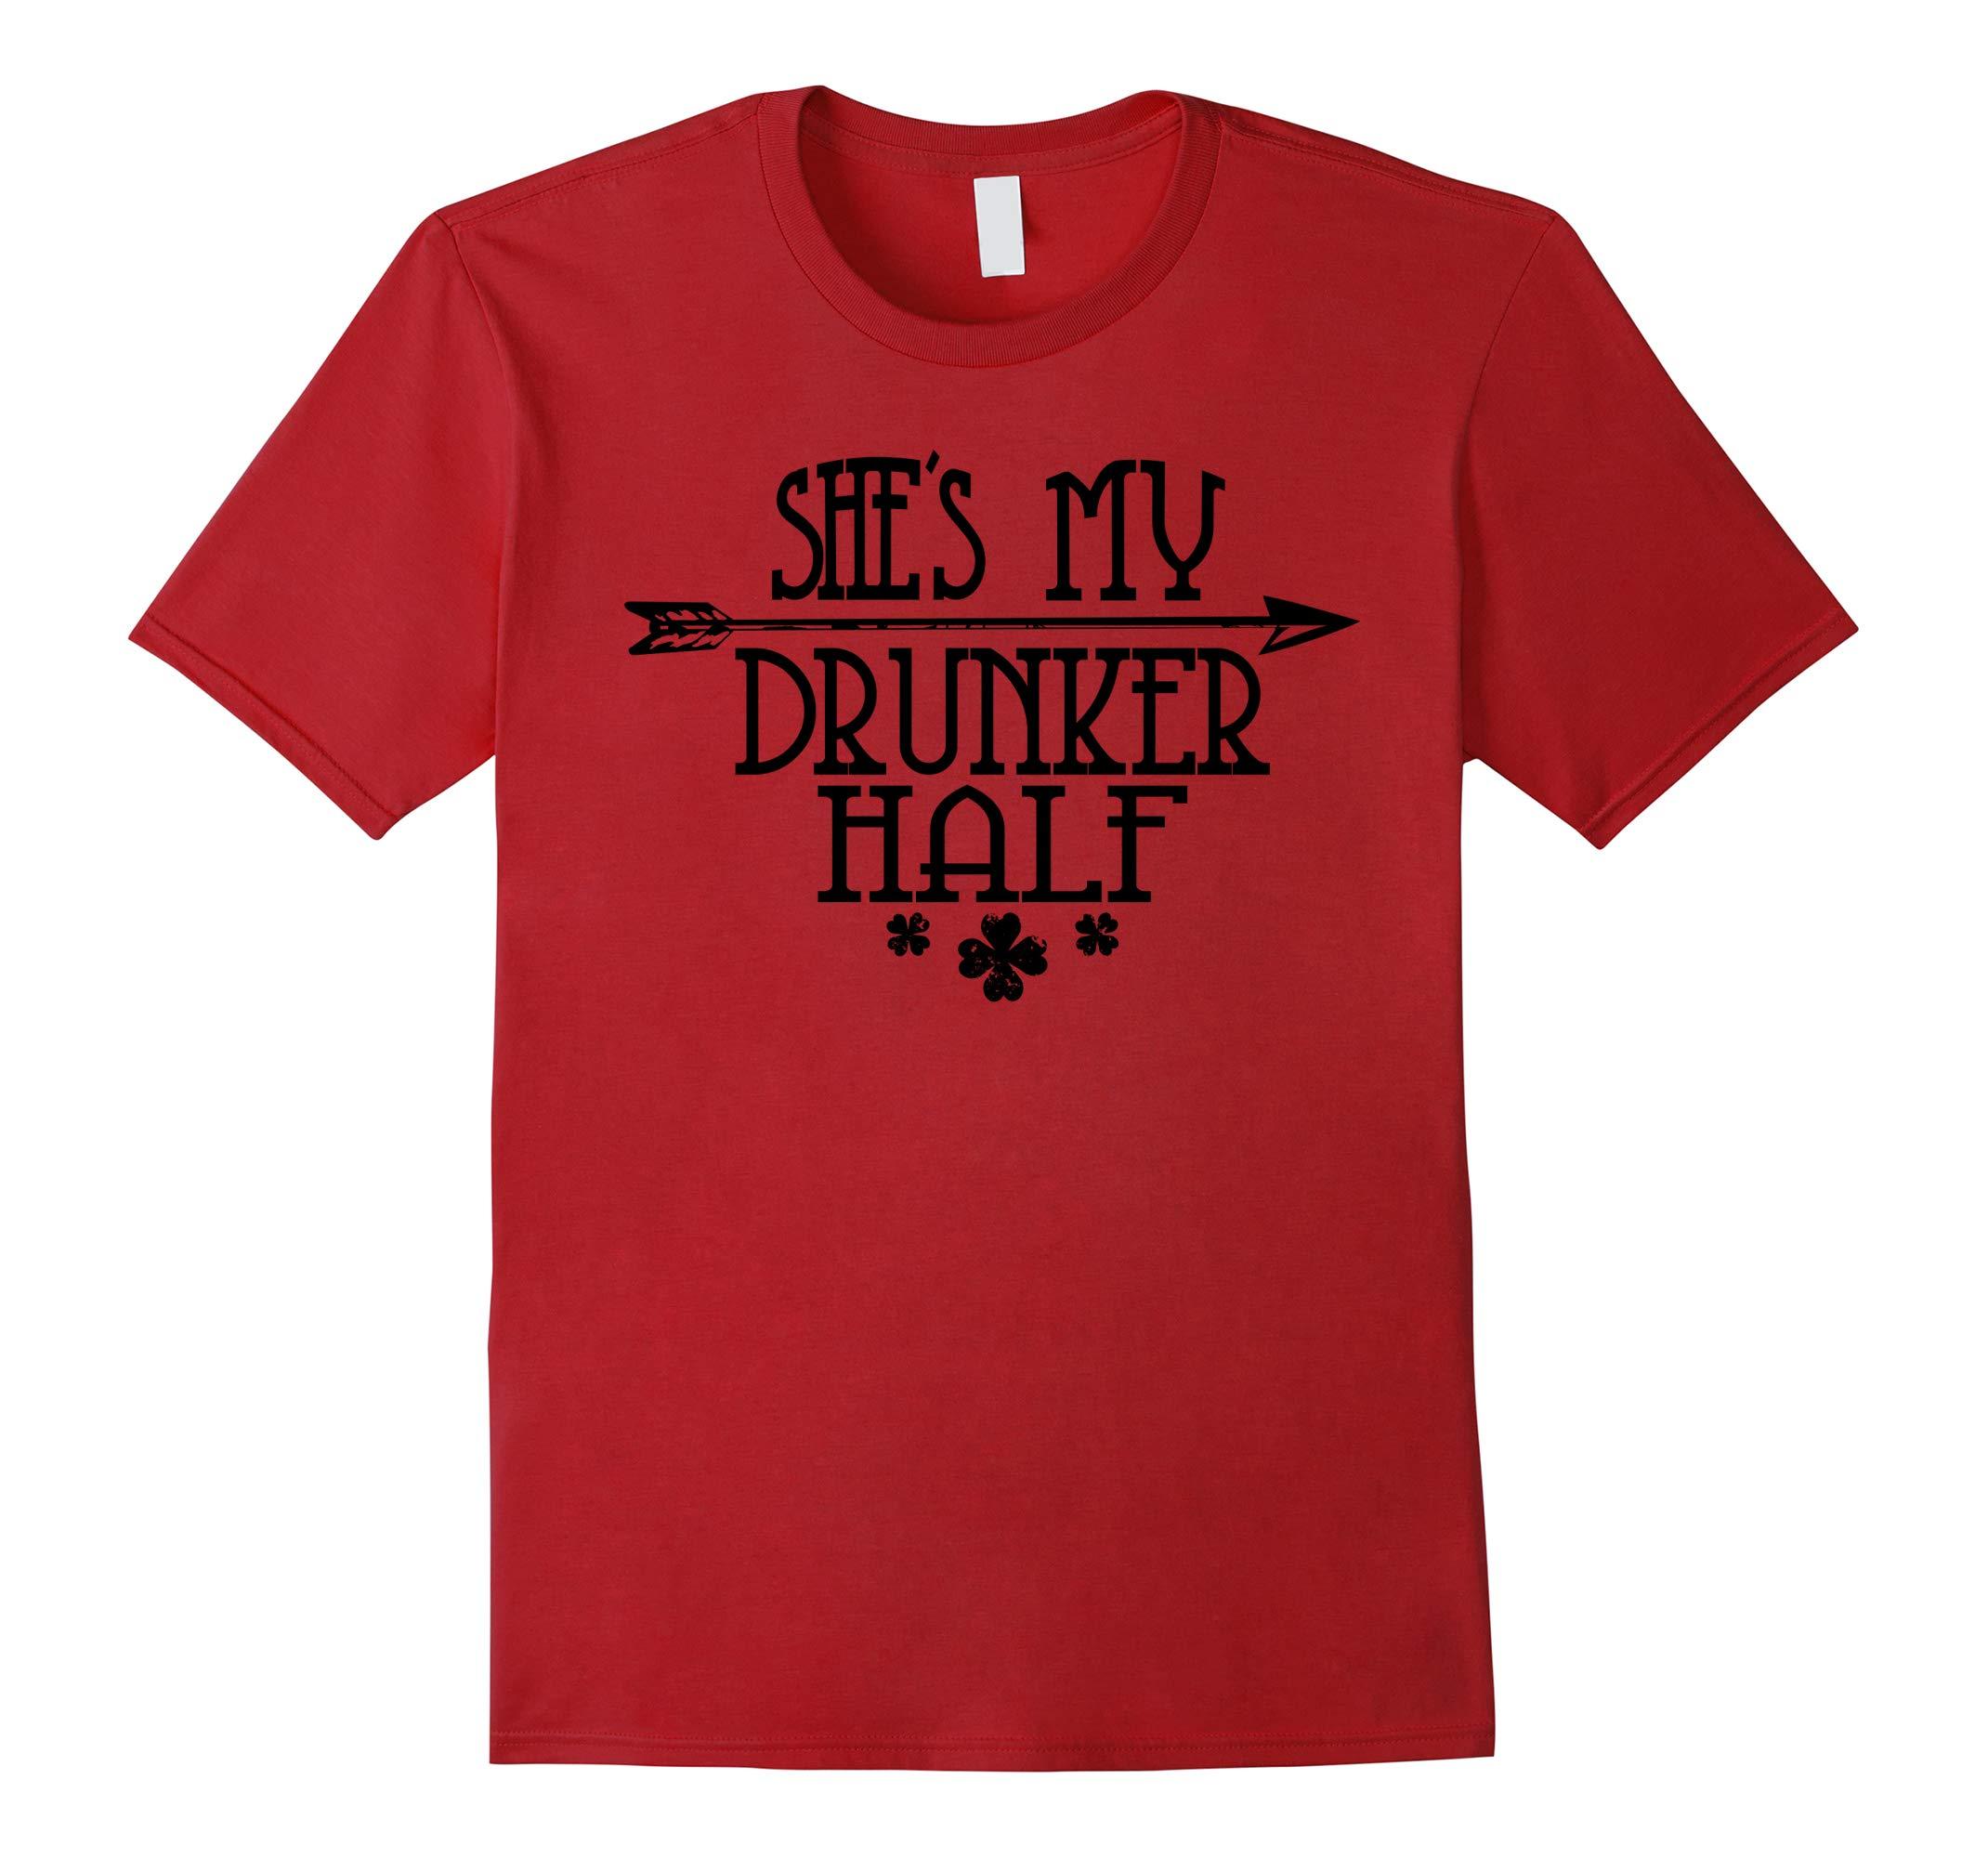 She's My Drunker Half Funny St Patrick's Day Shirt Pub Shirt-RT